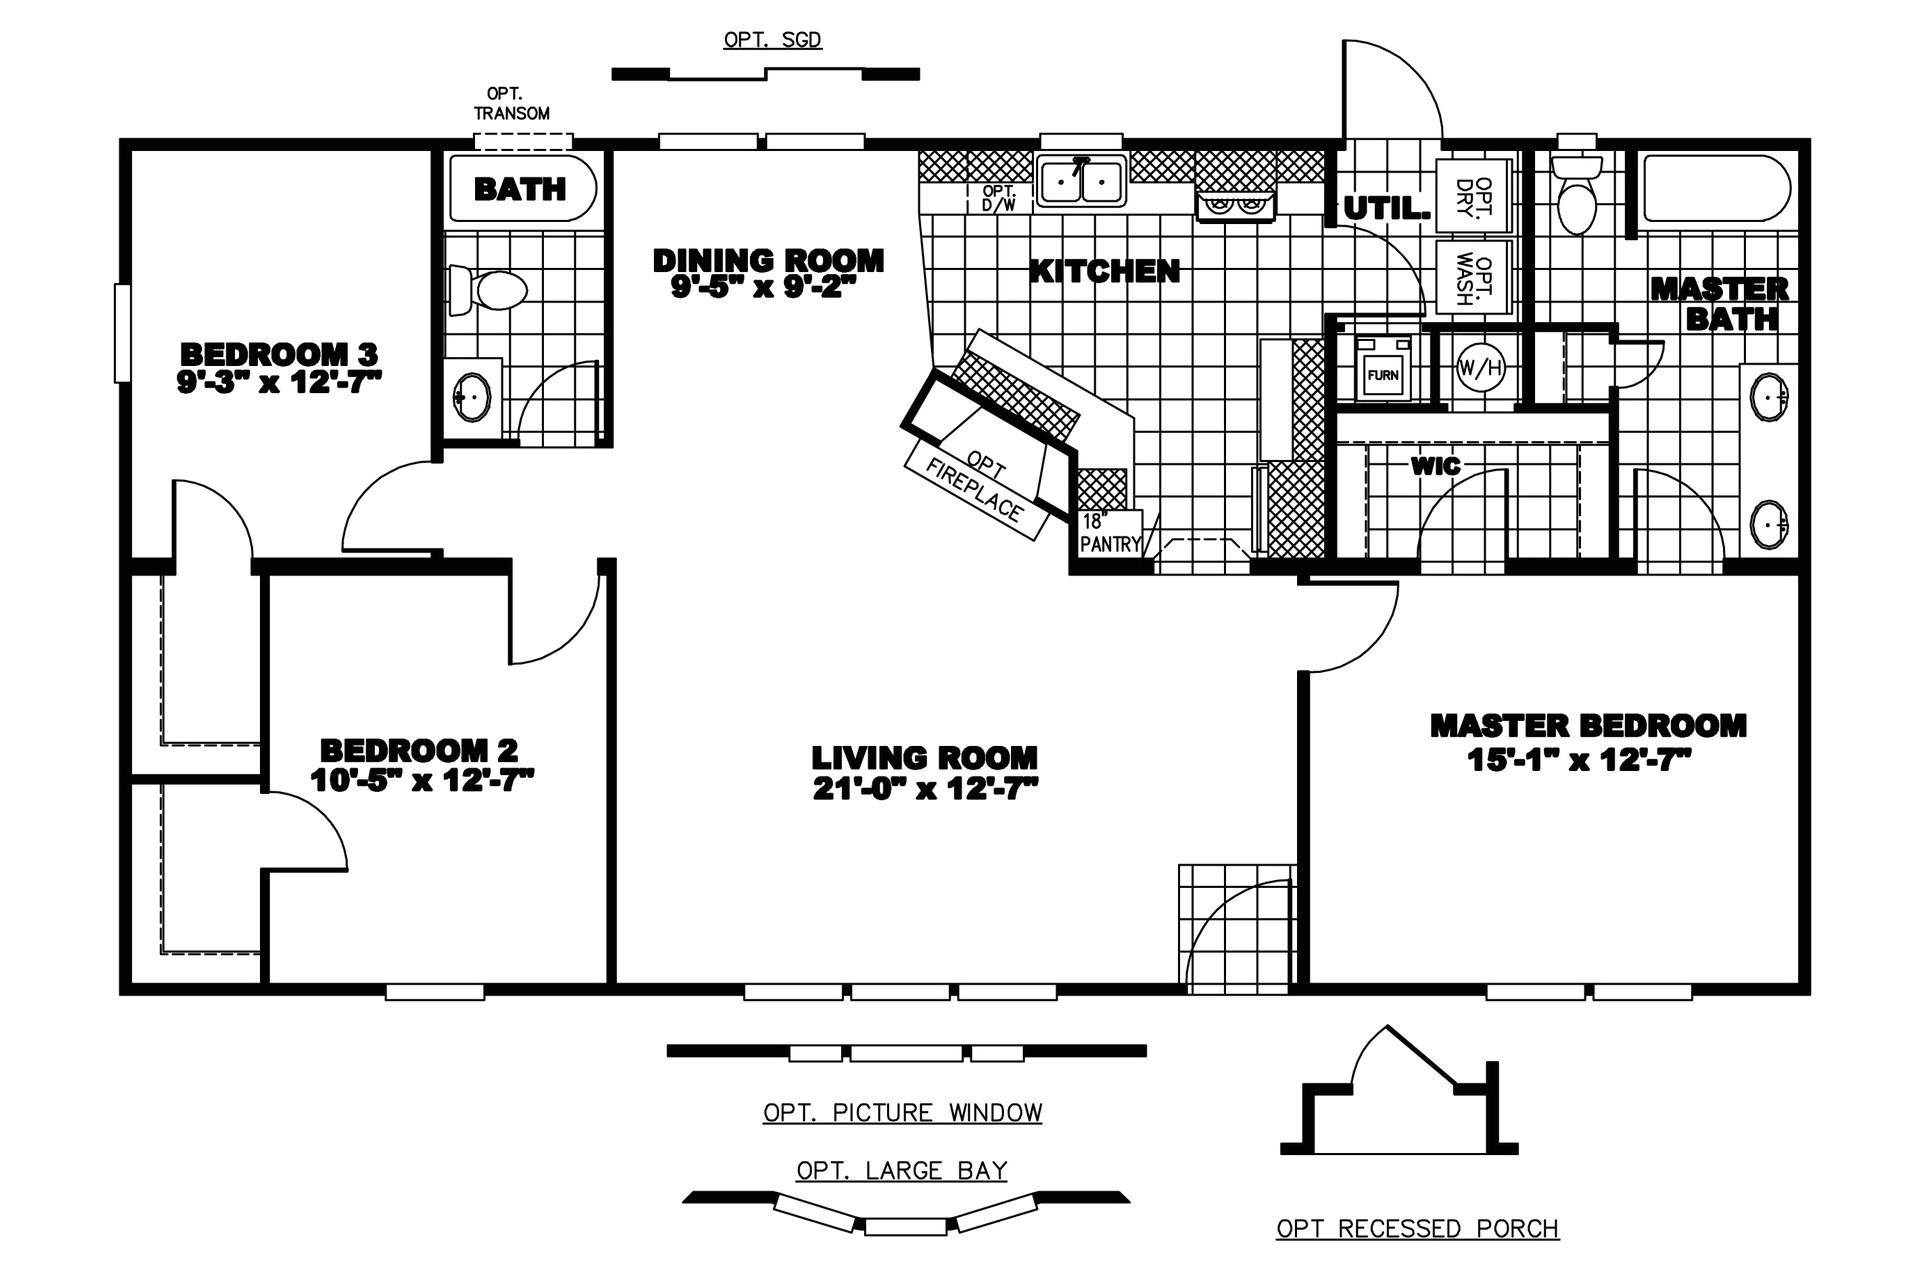 clayton gaston manor gma 293947 3